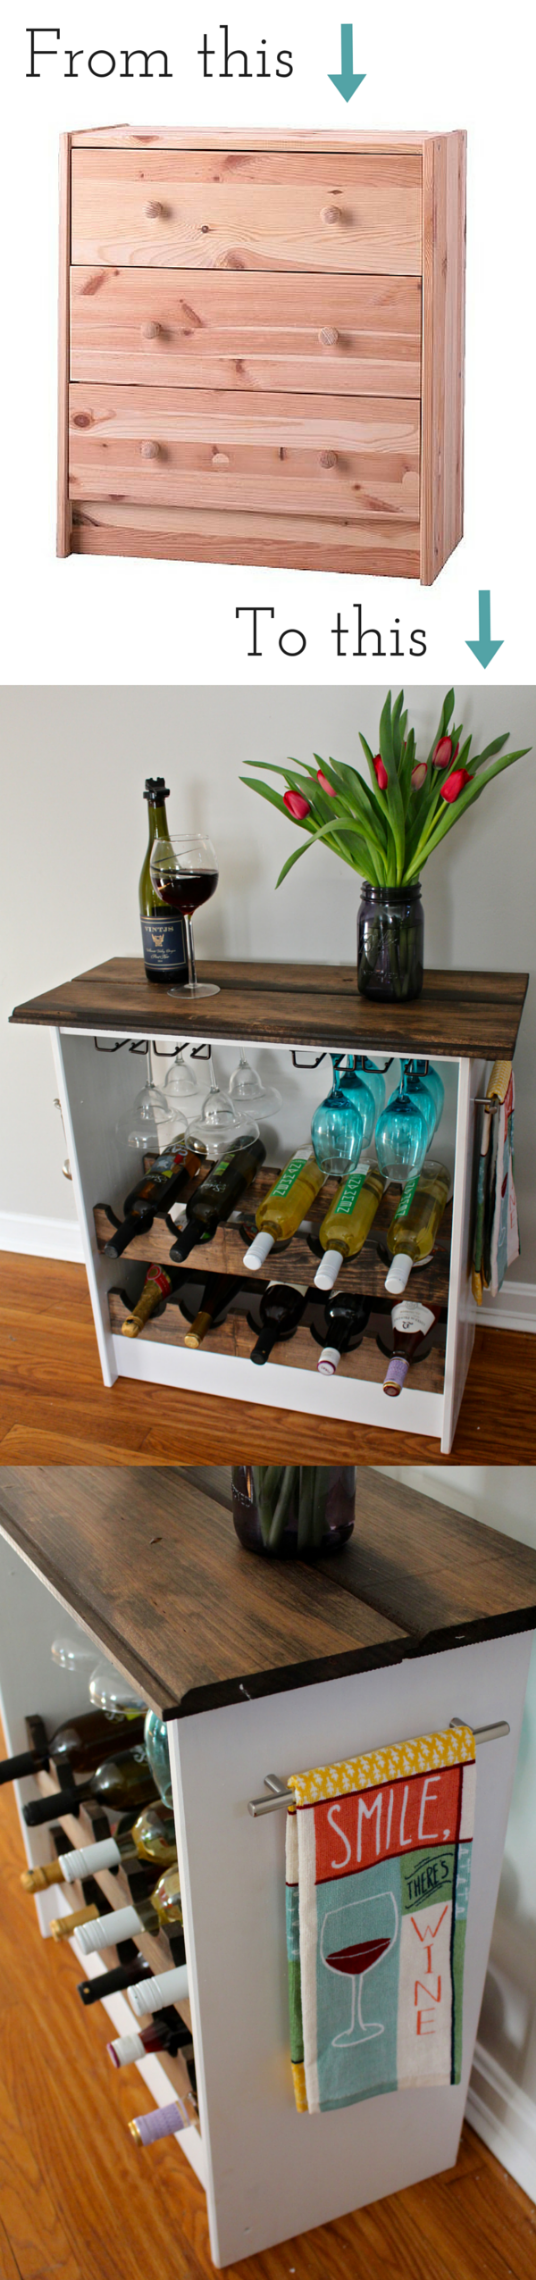 Ikea Hack turning a Rast dresser into a wine rack